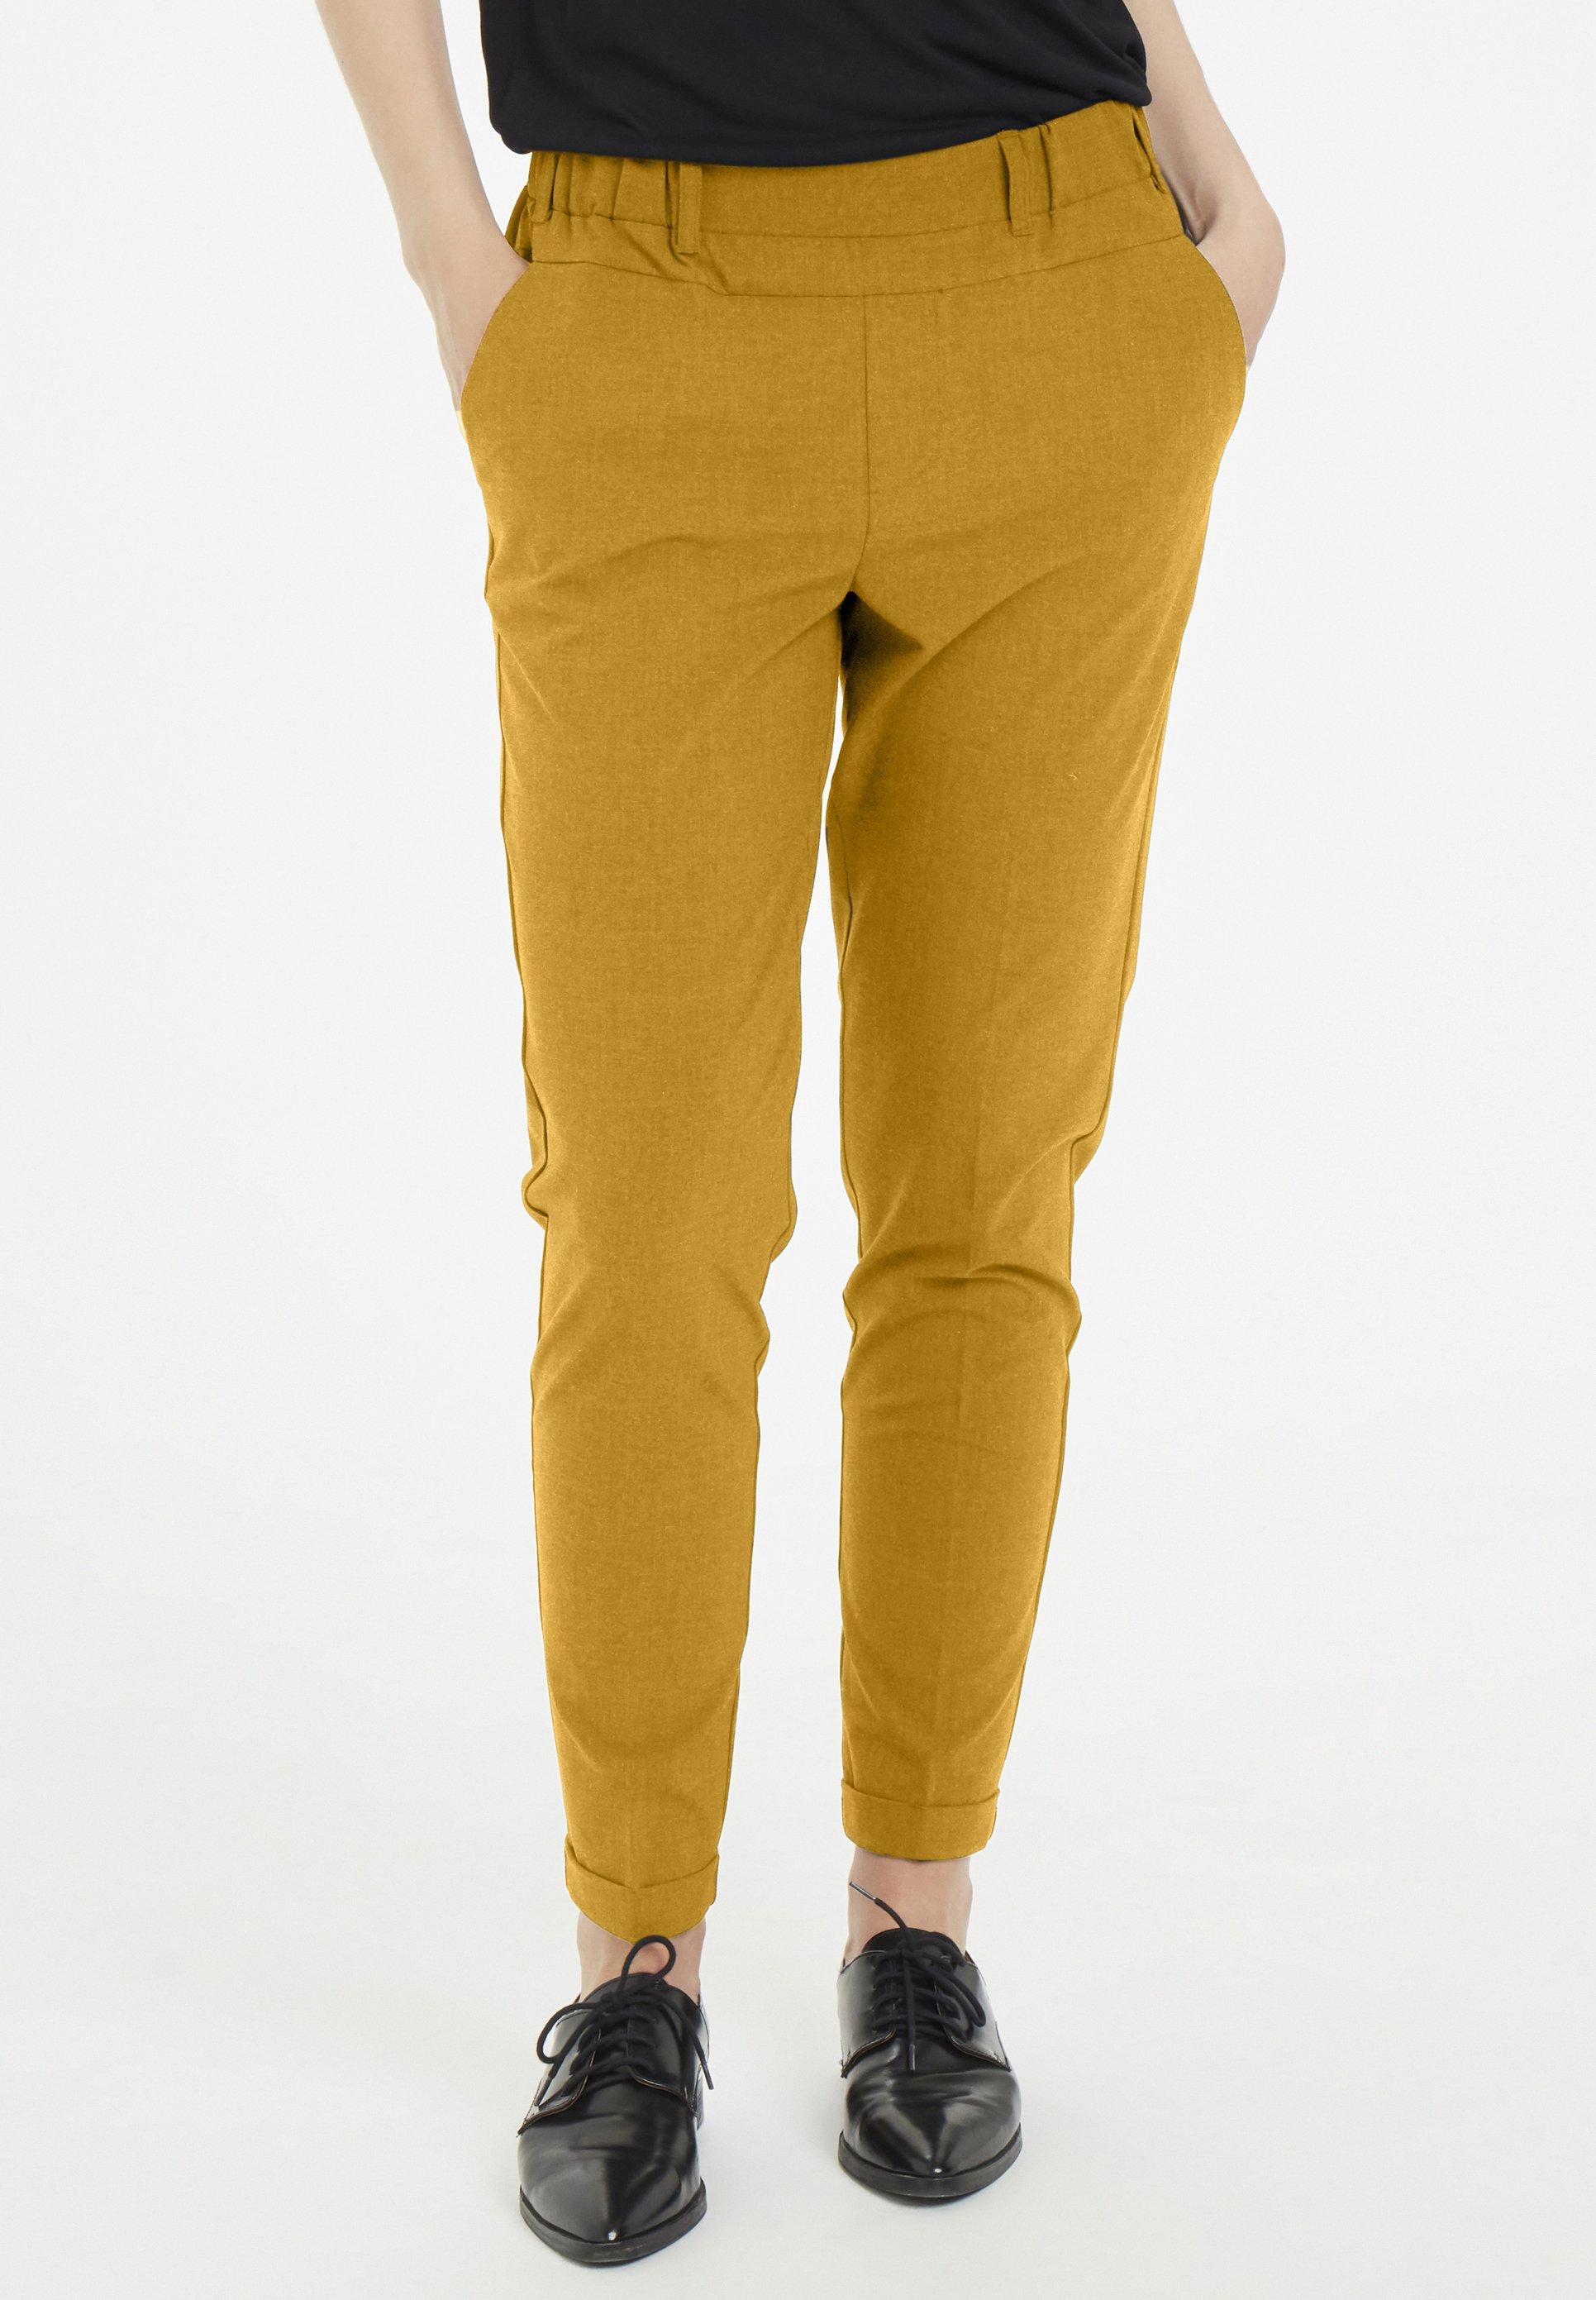 Best Selling New And Fashion Women's Clothing Kaffe NANCI JILLIAN Trousers buckthorn G3ArFUMAY pi7TYpVw6